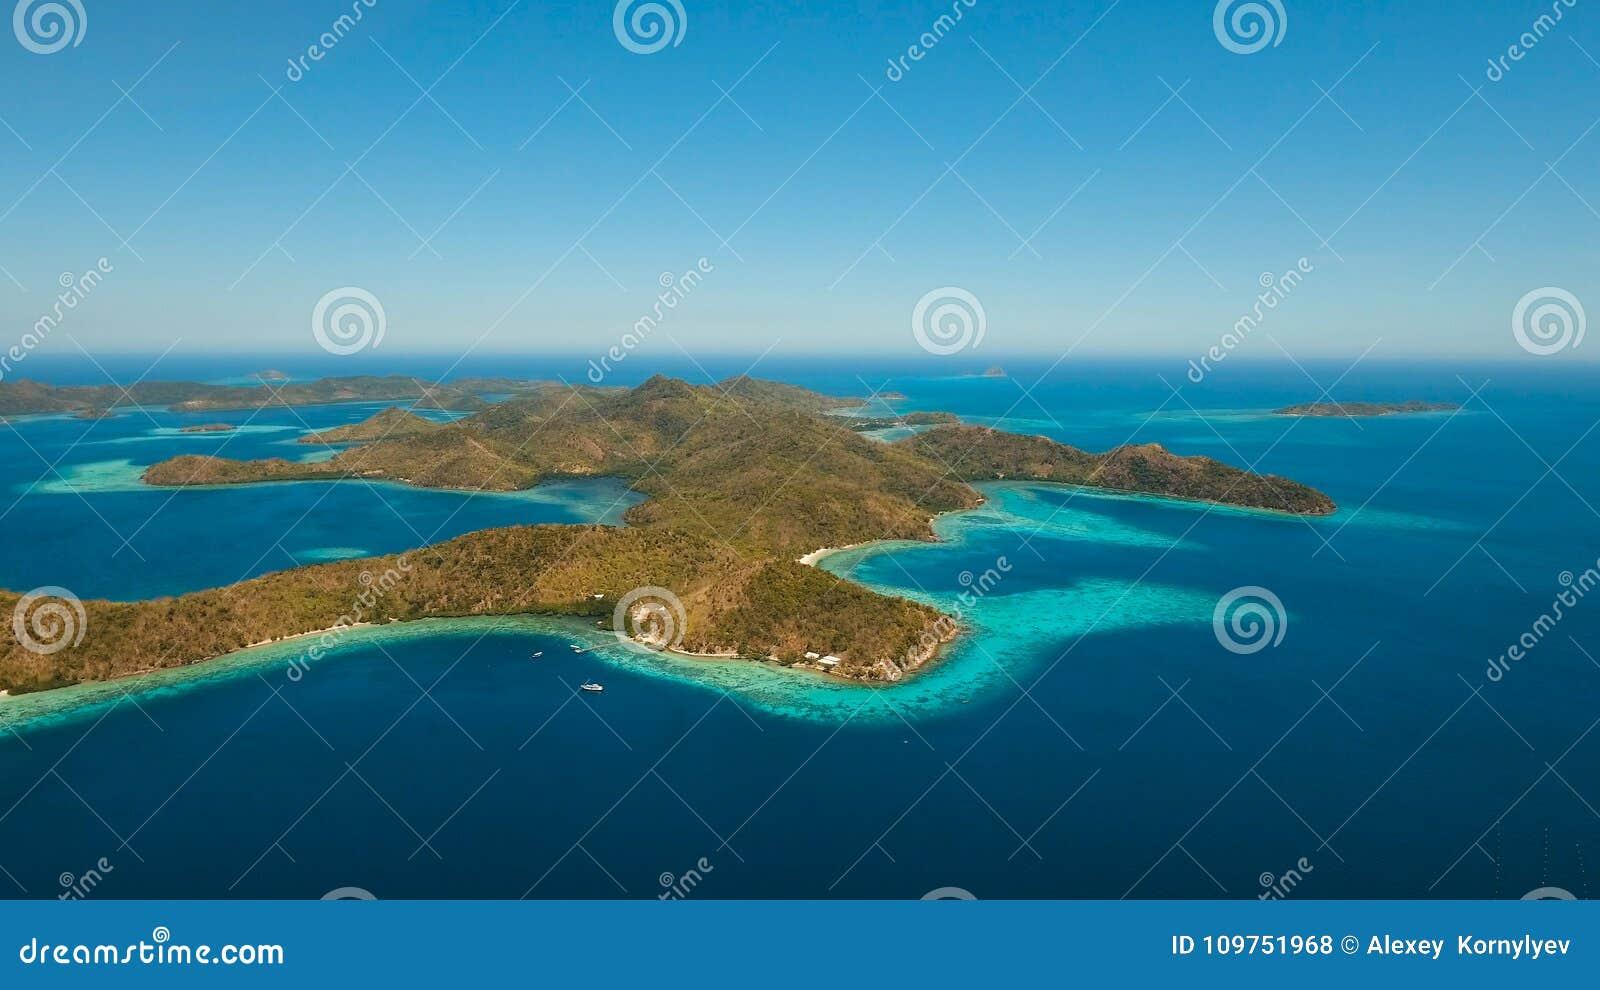 Tropische Lagune der Vogelperspektive, Meer, Strand Tropische Insel Coron, Palawan, Philippinen